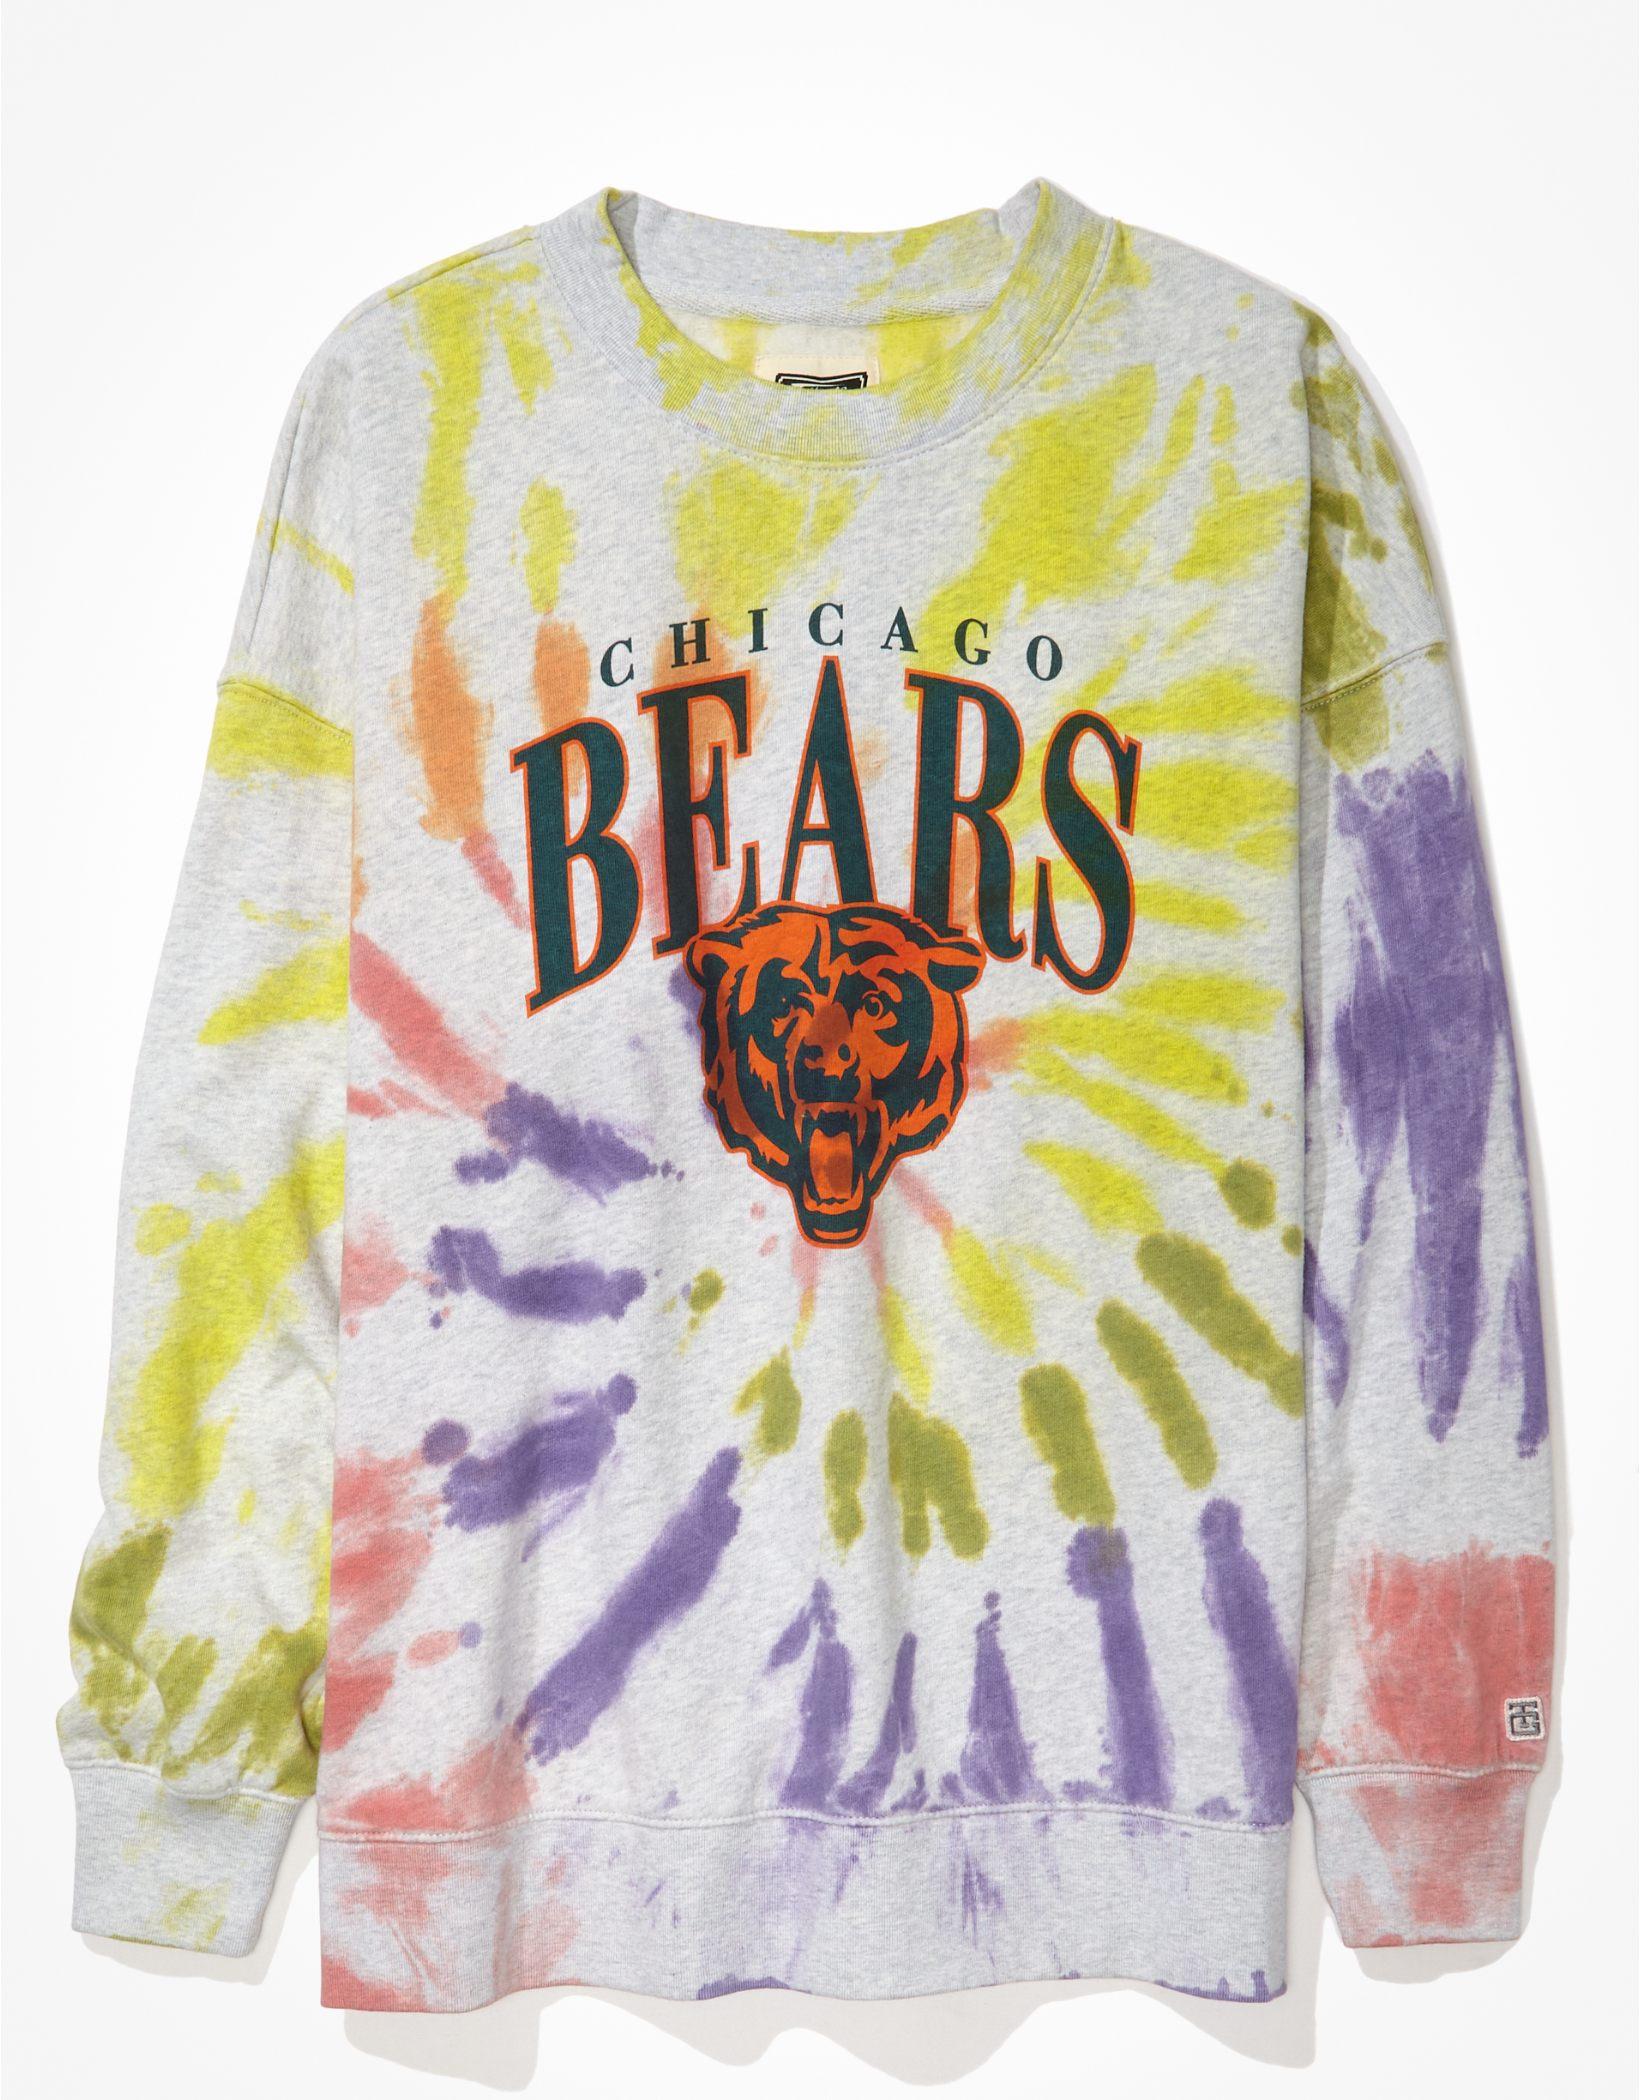 Tailgate Women's Chicago Bears Oversized Tie-Dye Sweatshirt